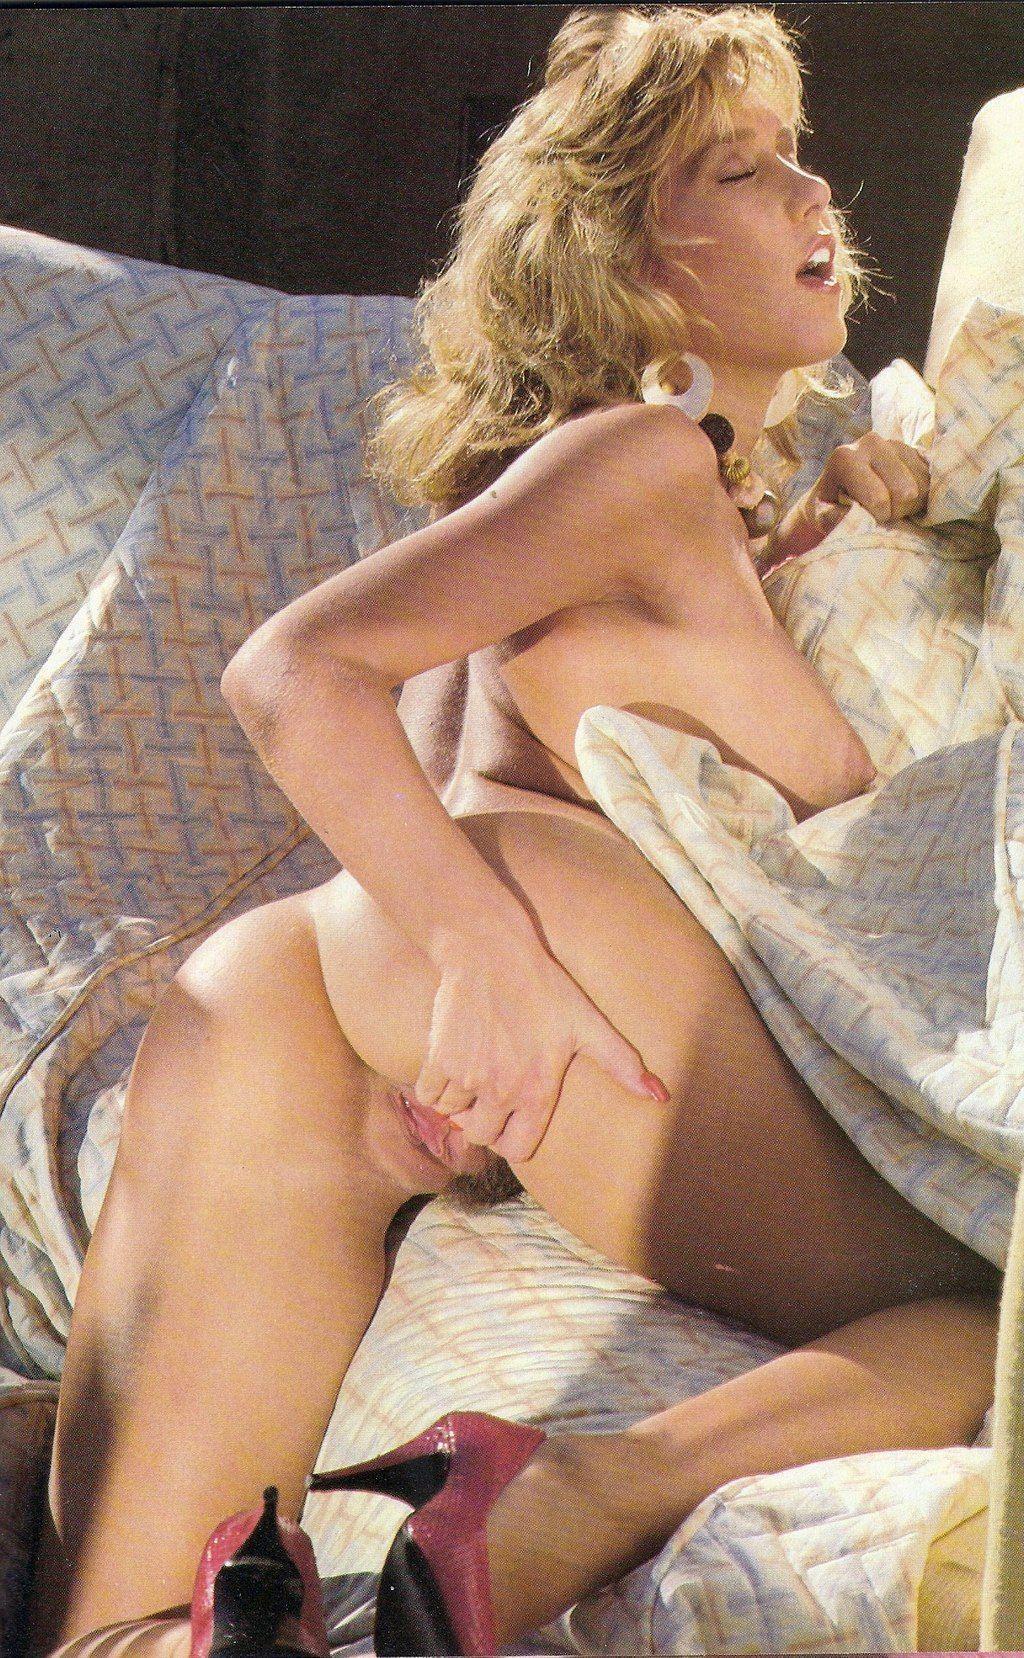 Best brazilian porn star